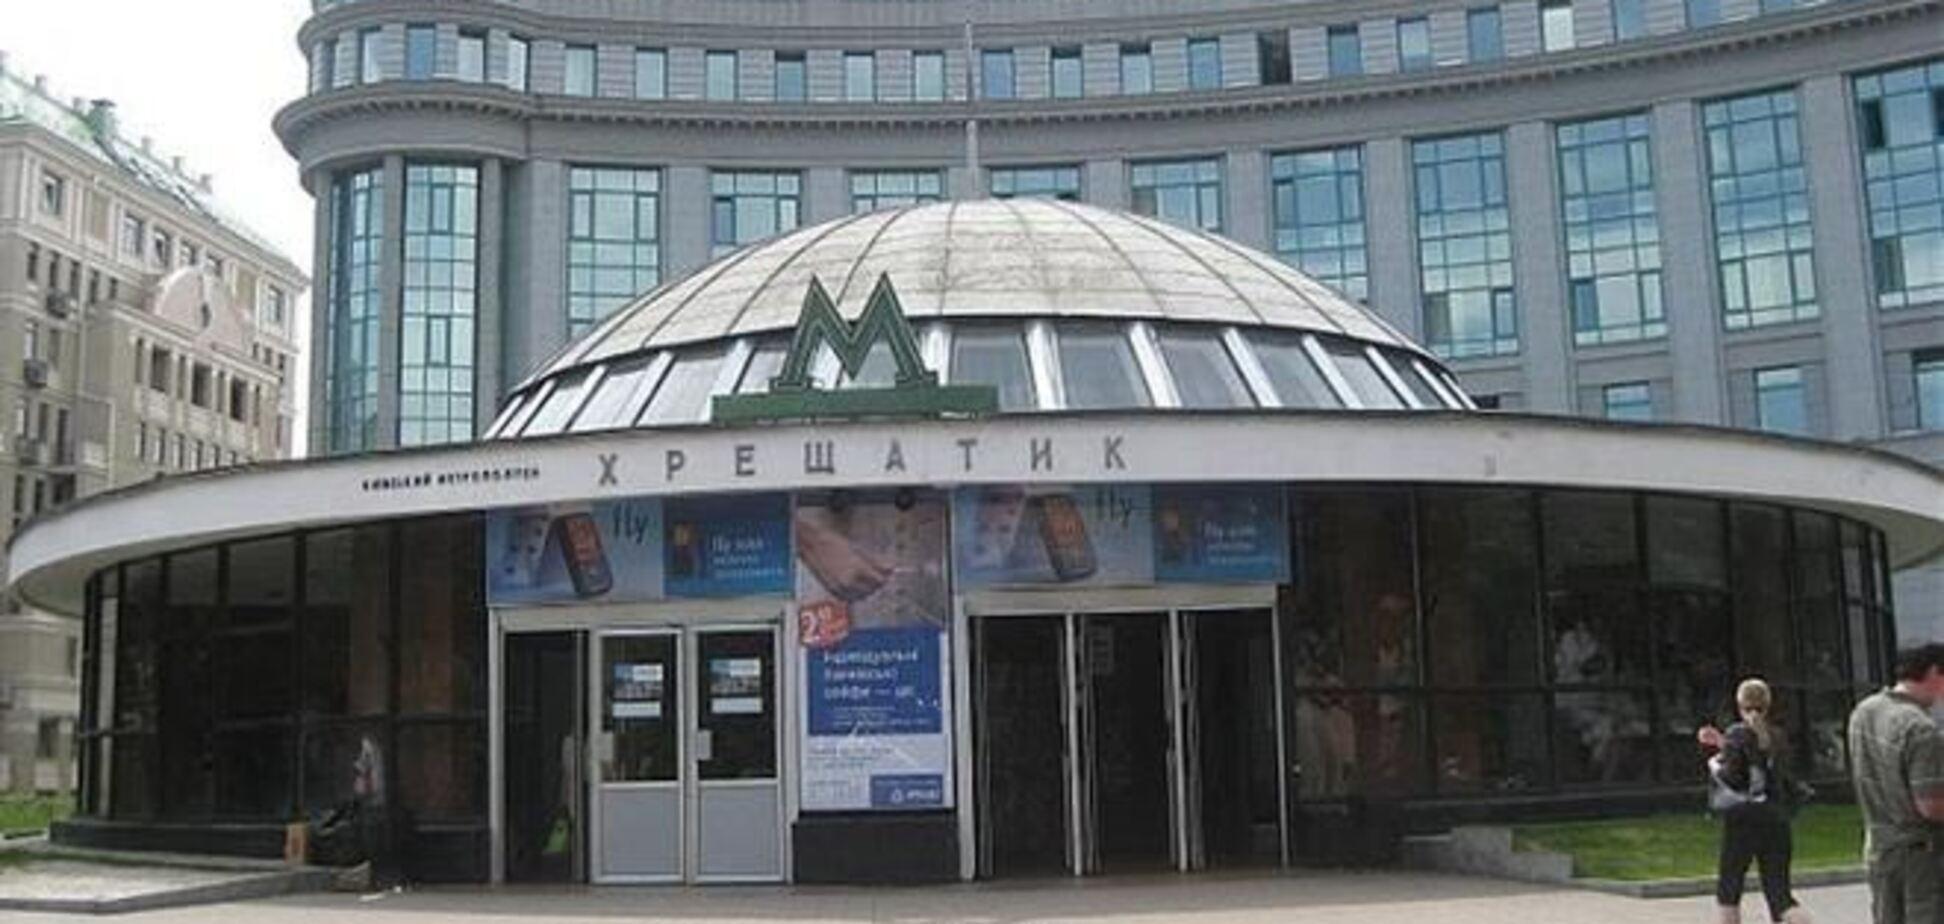 Станции метро 'Крещатик' и 'Майдан Незалежности' 'разминировали'